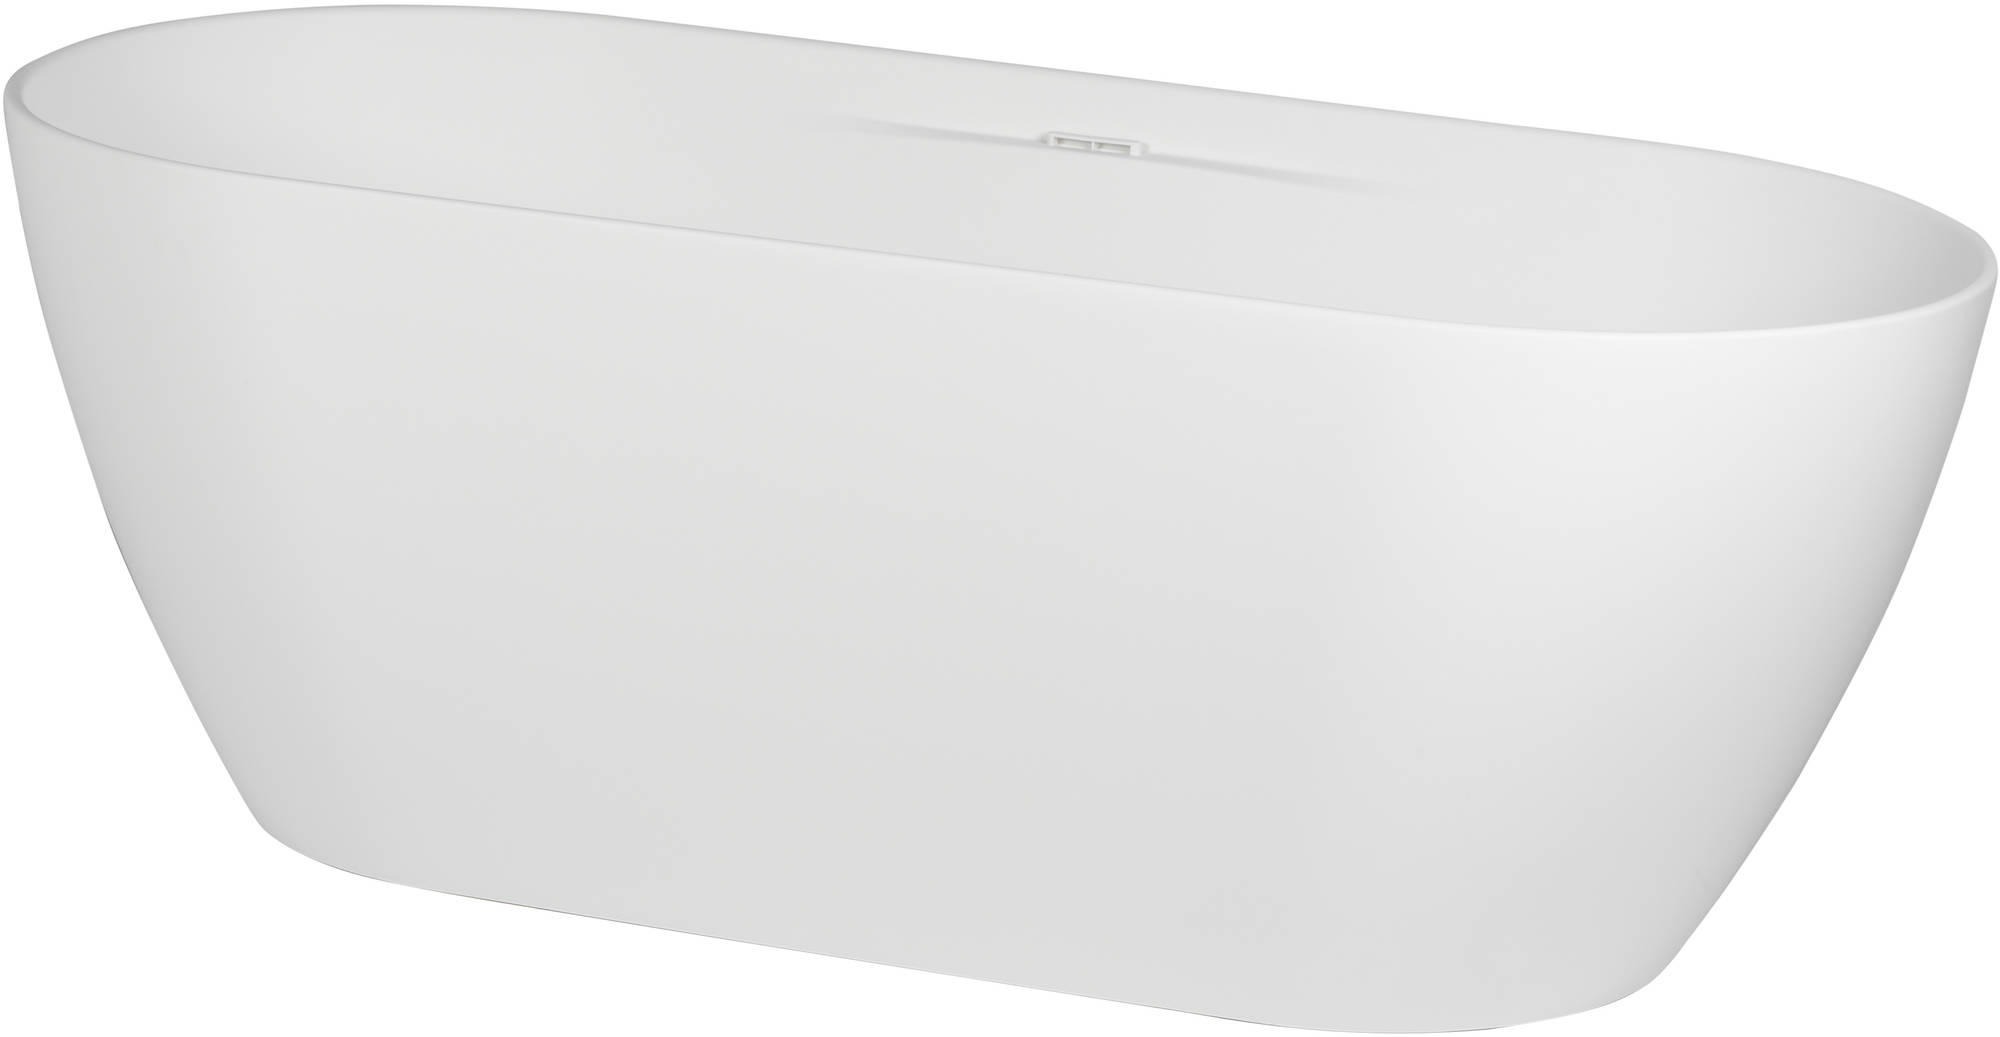 Ben Steno vrijstaand bad 170x75 cm Solid Surface Mat Wit